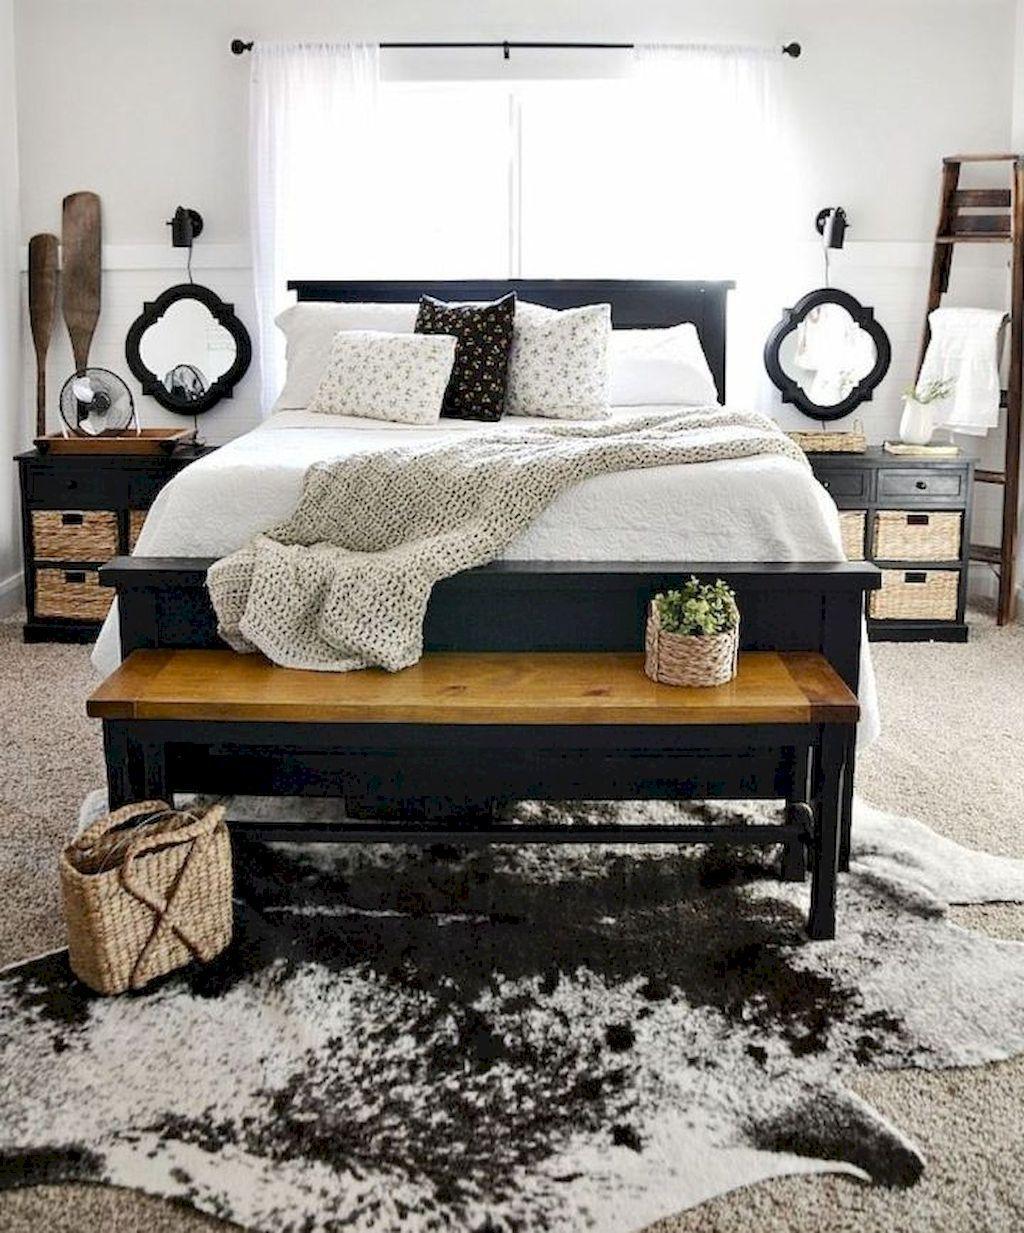 farmhouse style master bedroom ideas 40 farmhouse style master rh in pinterest com